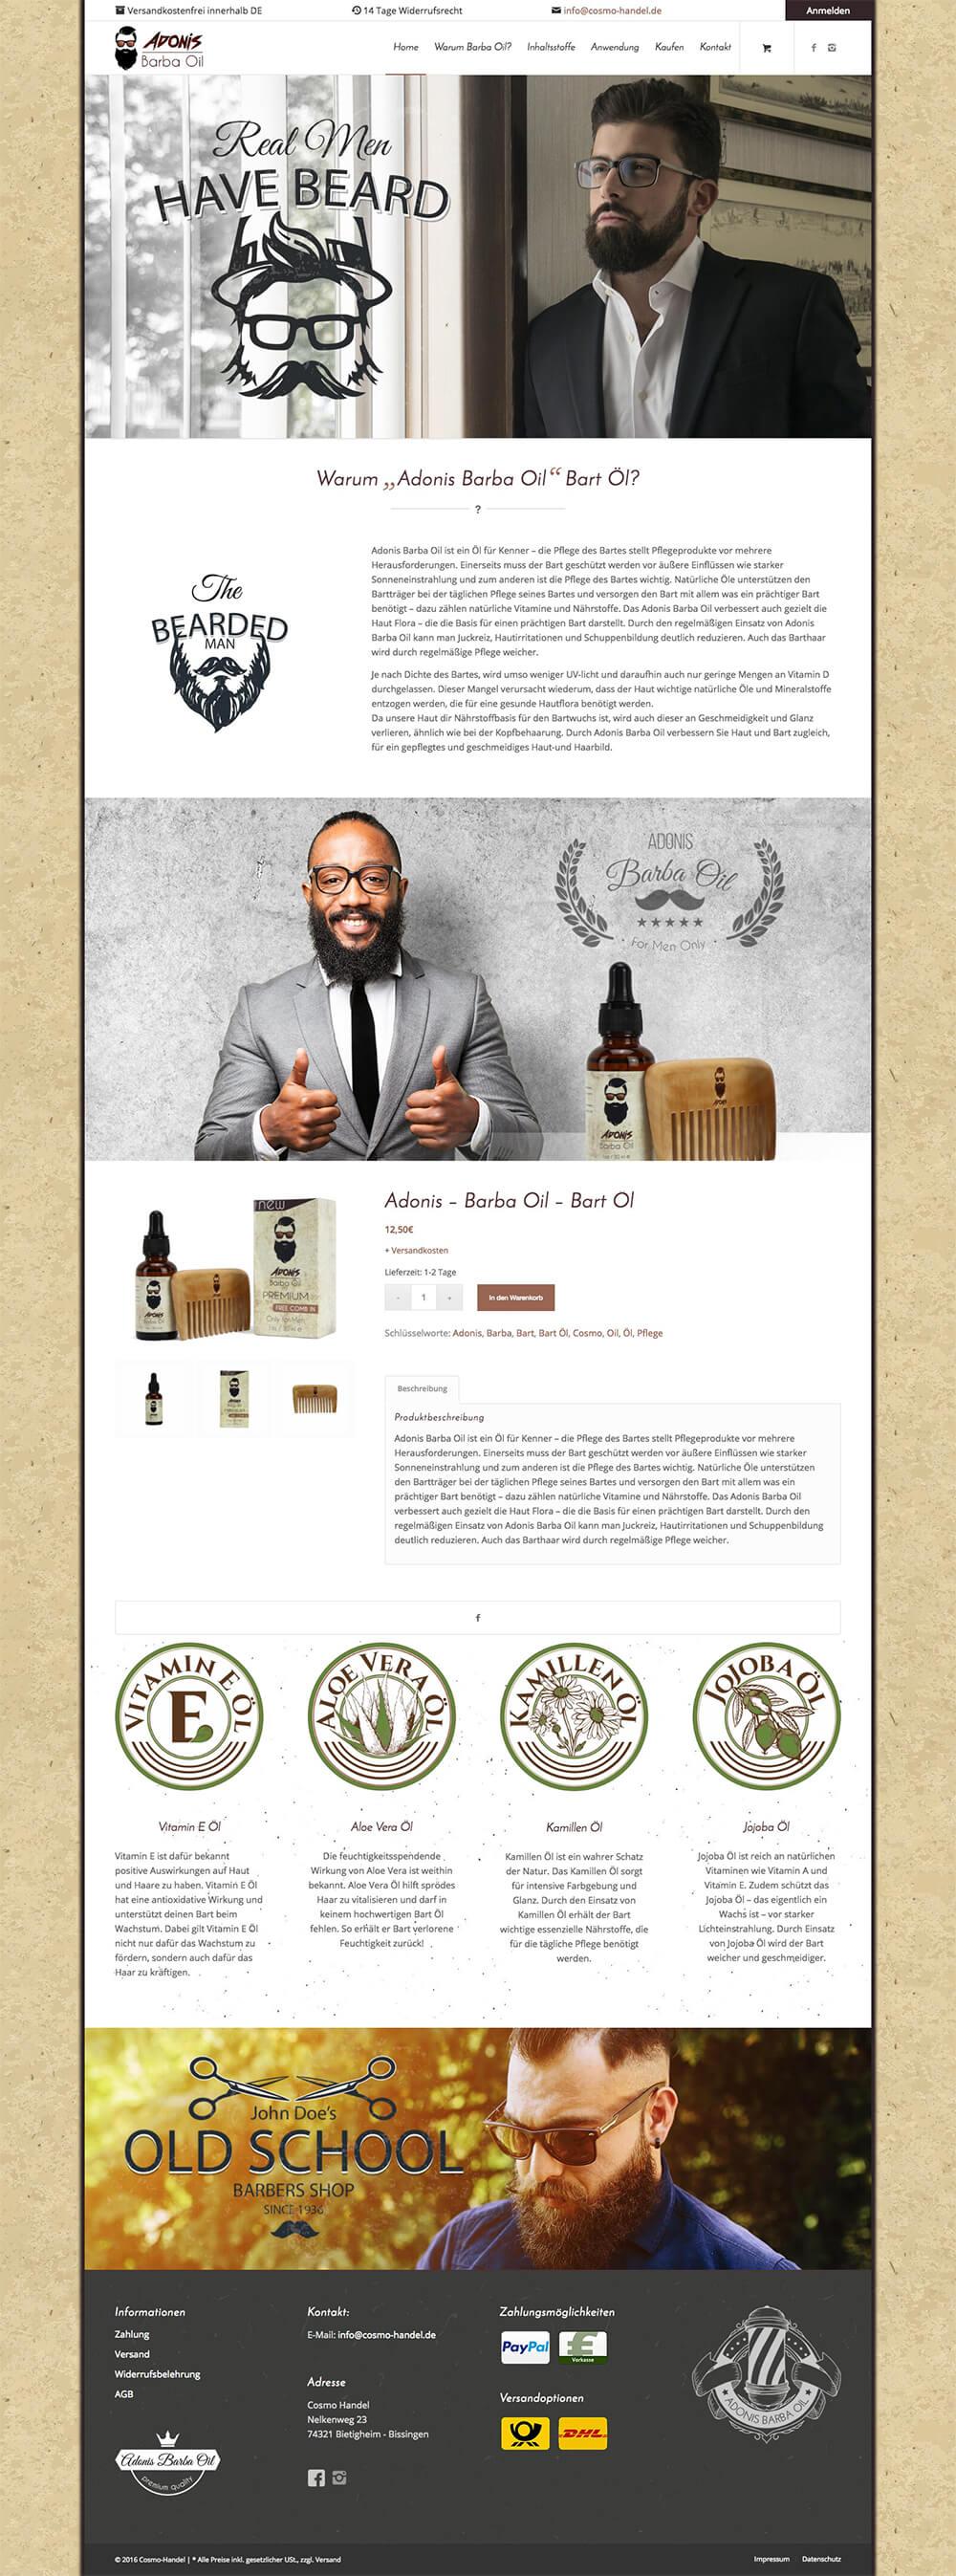 Adonis Barba Oil